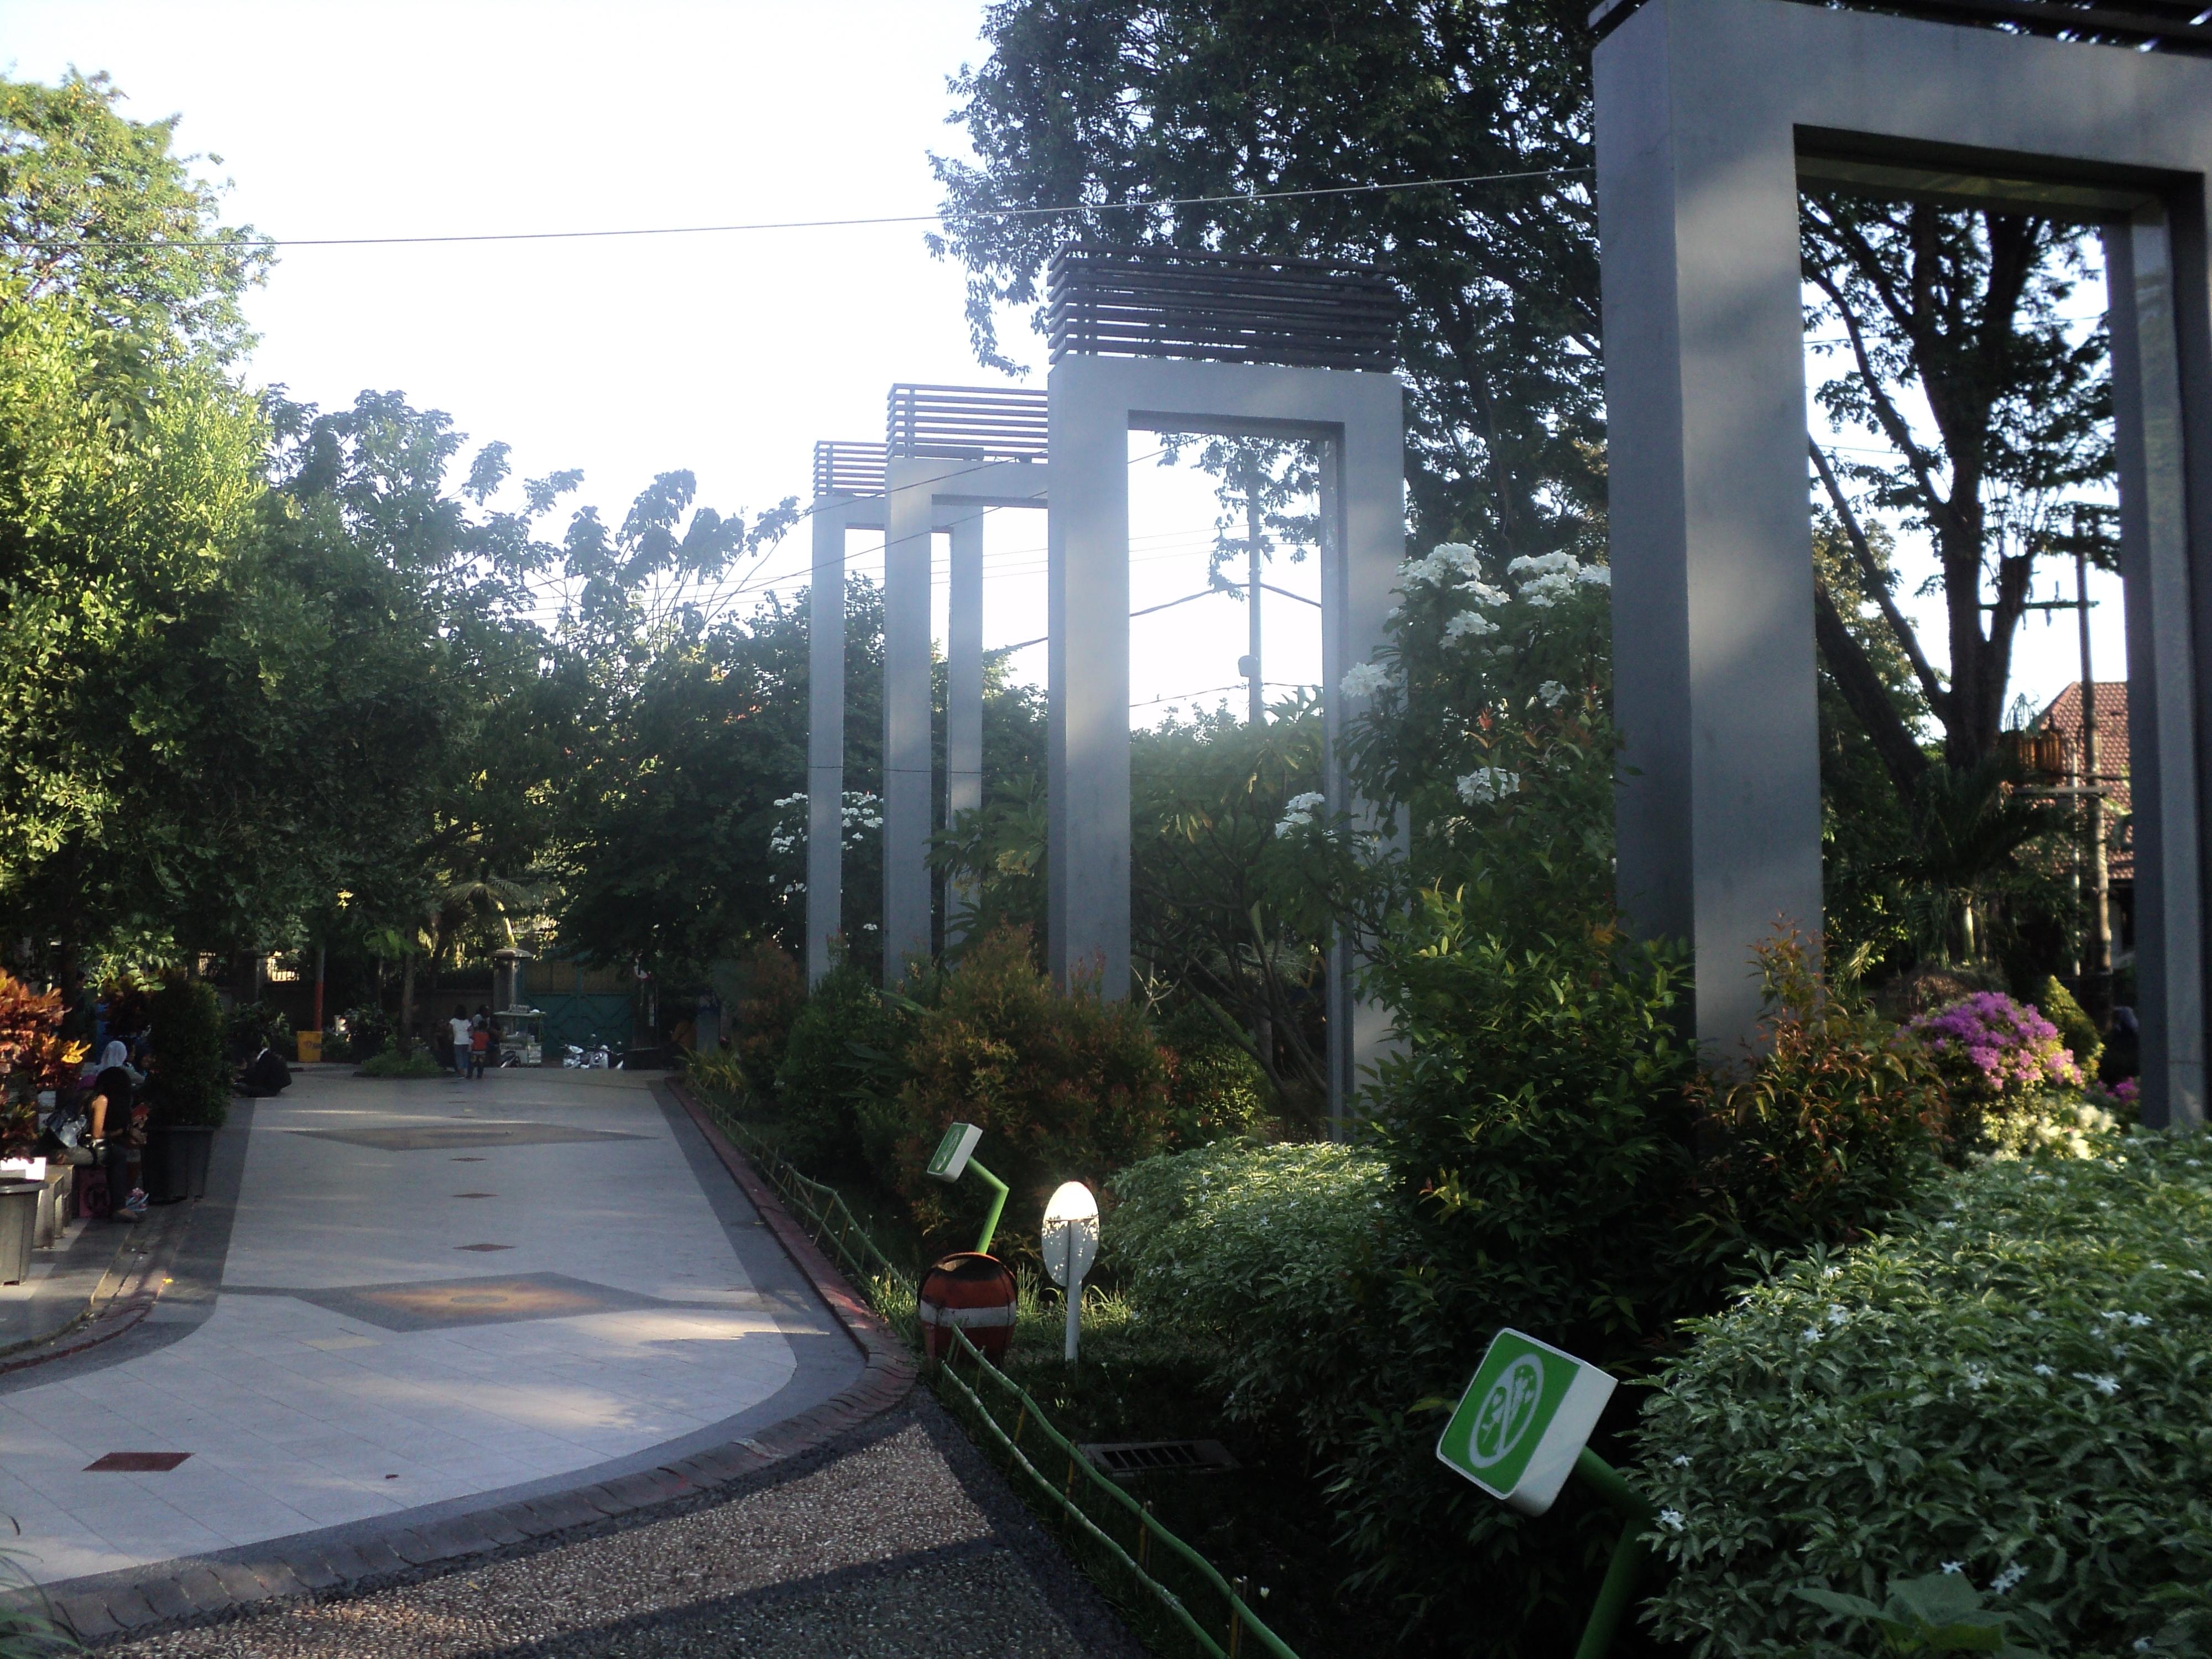 Taman Surabaya Barat Pesona Kota Bungkul Dr Soetomo Persahabatan